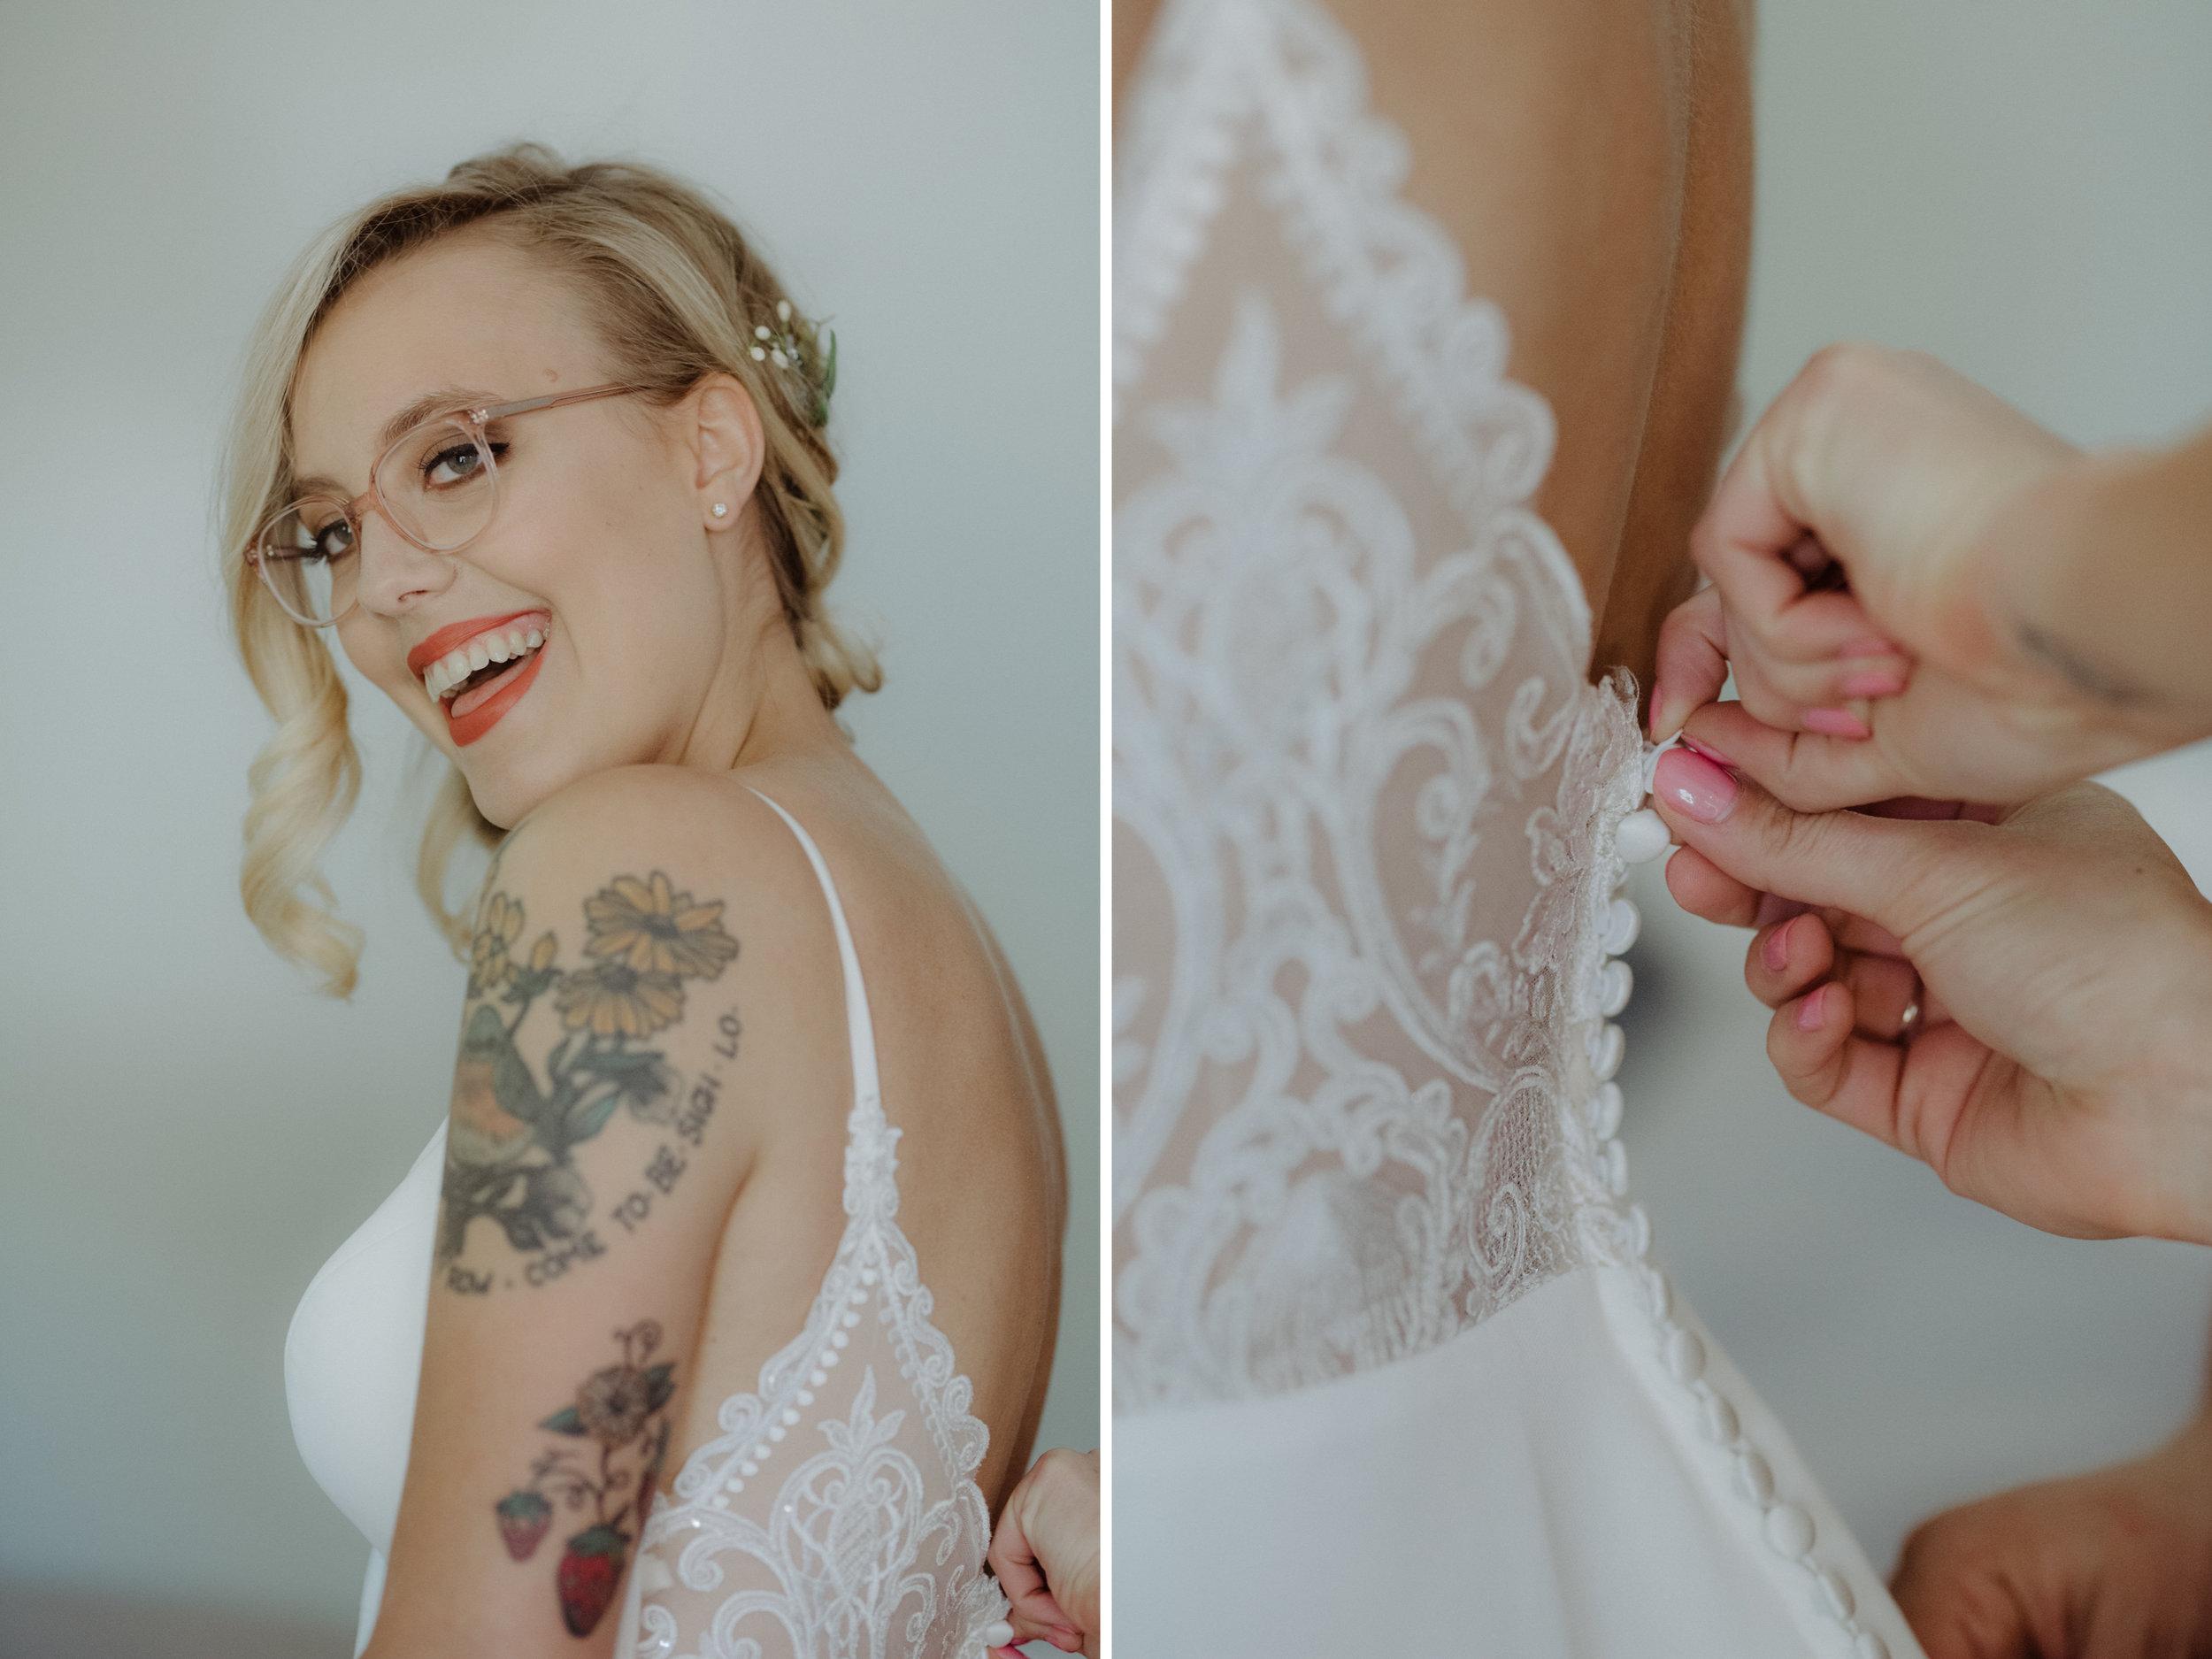 enowen-wedding-photography-mike-anna-suffolk-punch-charlotte